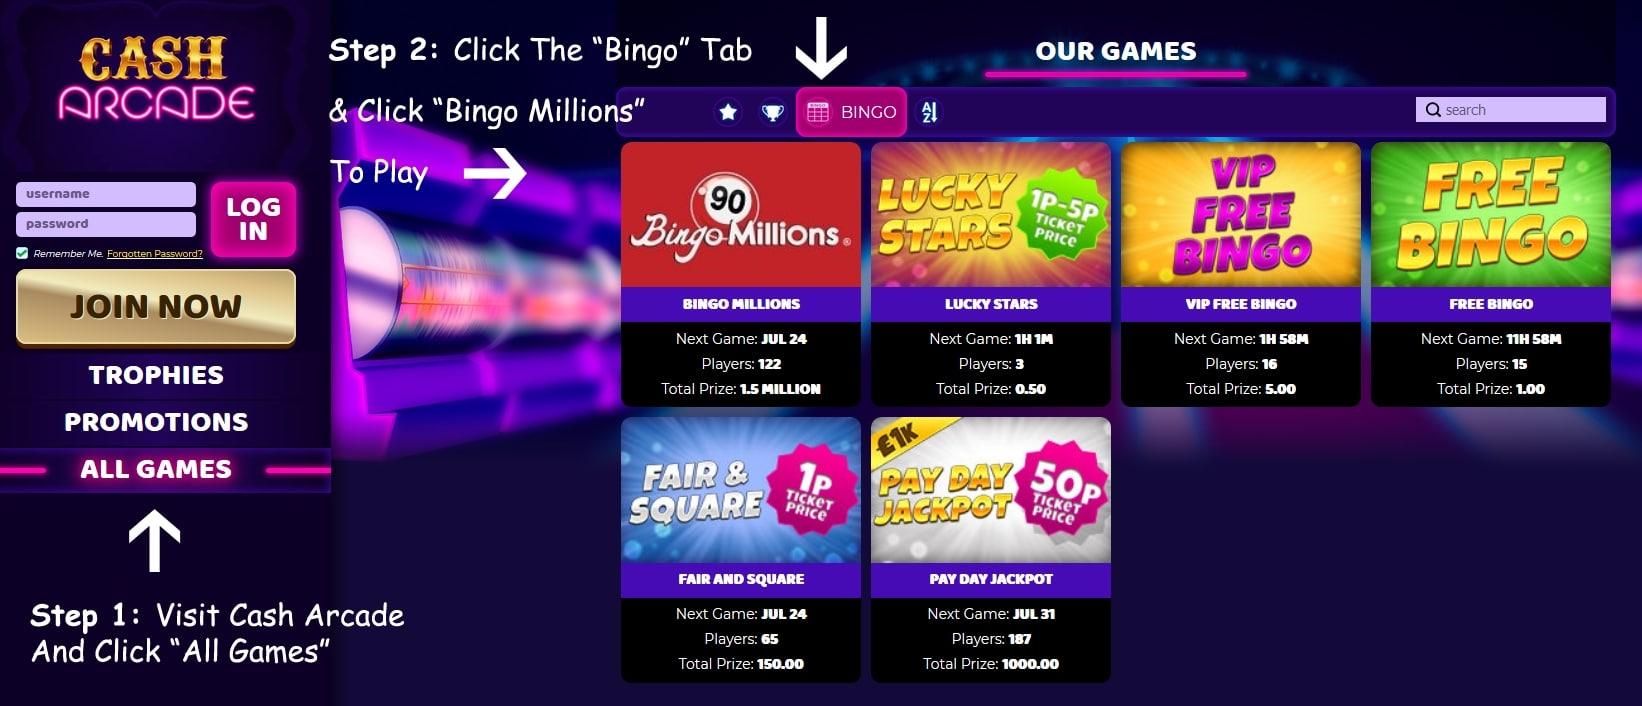 Cash Arcade Bingo Offer